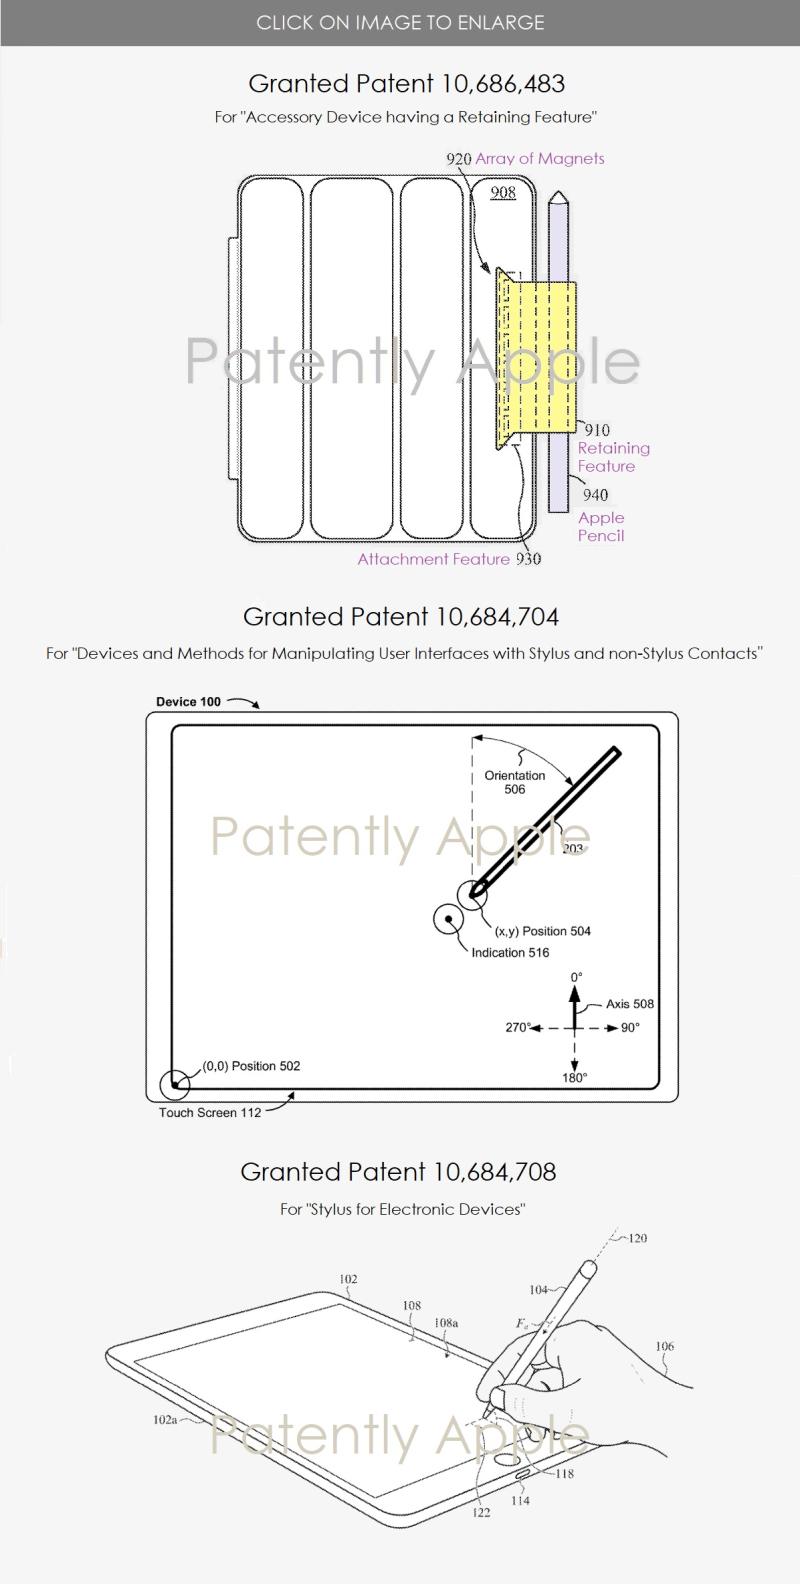 2 Apple Pencil patents - Three - Granted